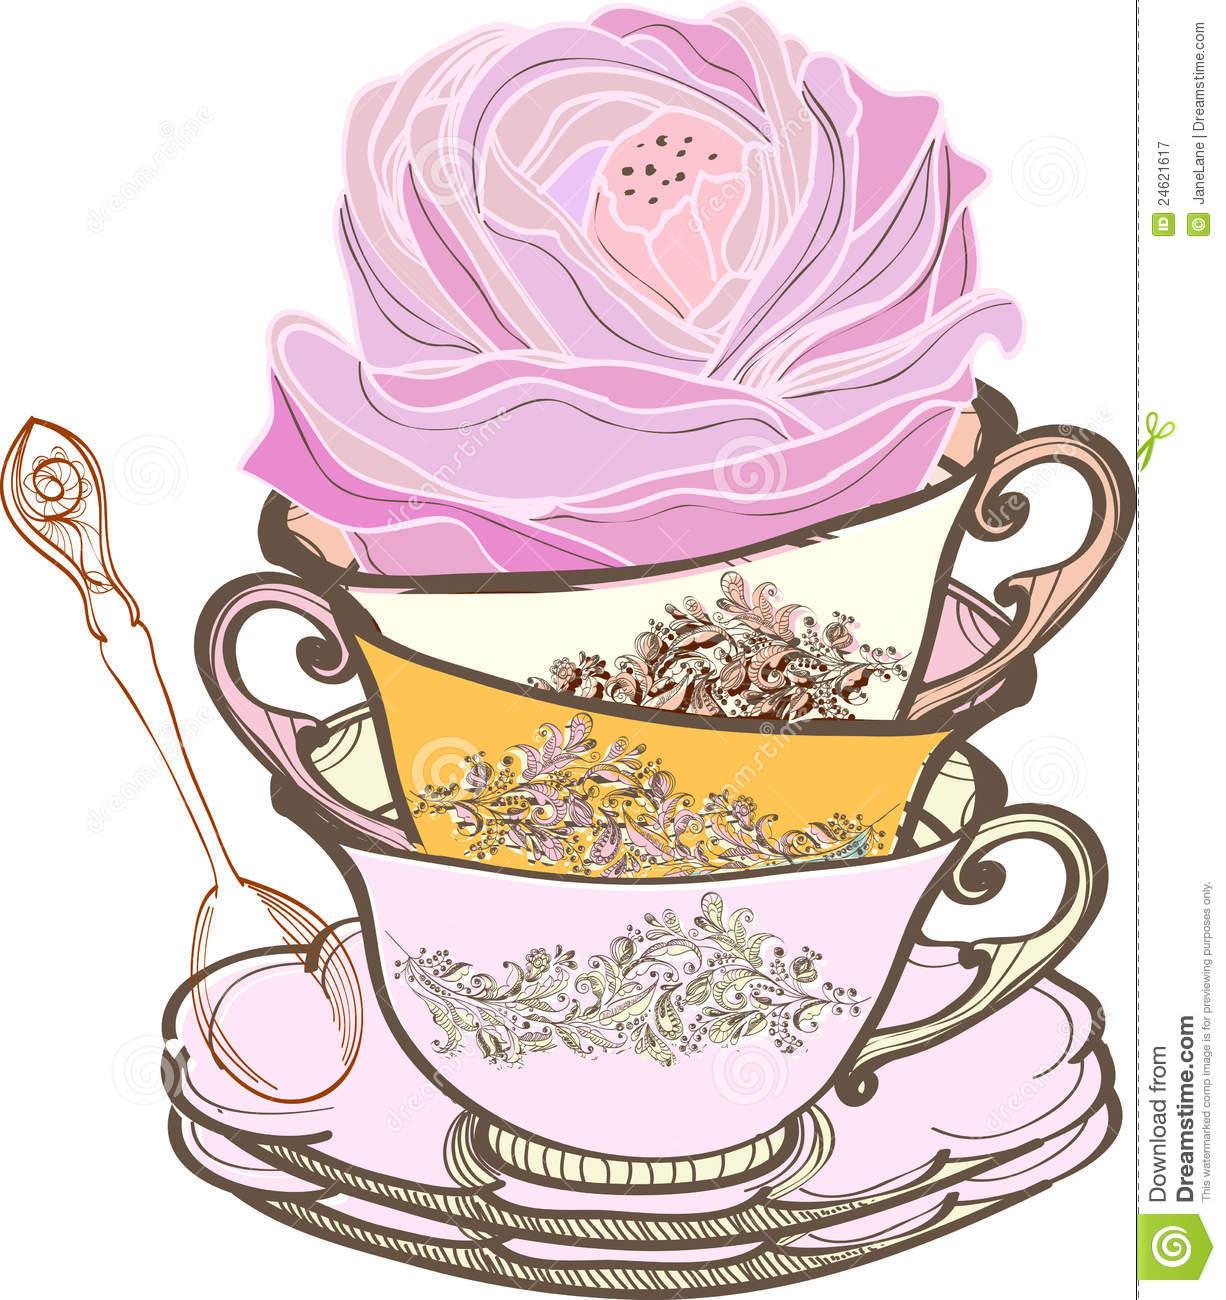 Kettle clipart tea cake Search Search decoration Teapot Google